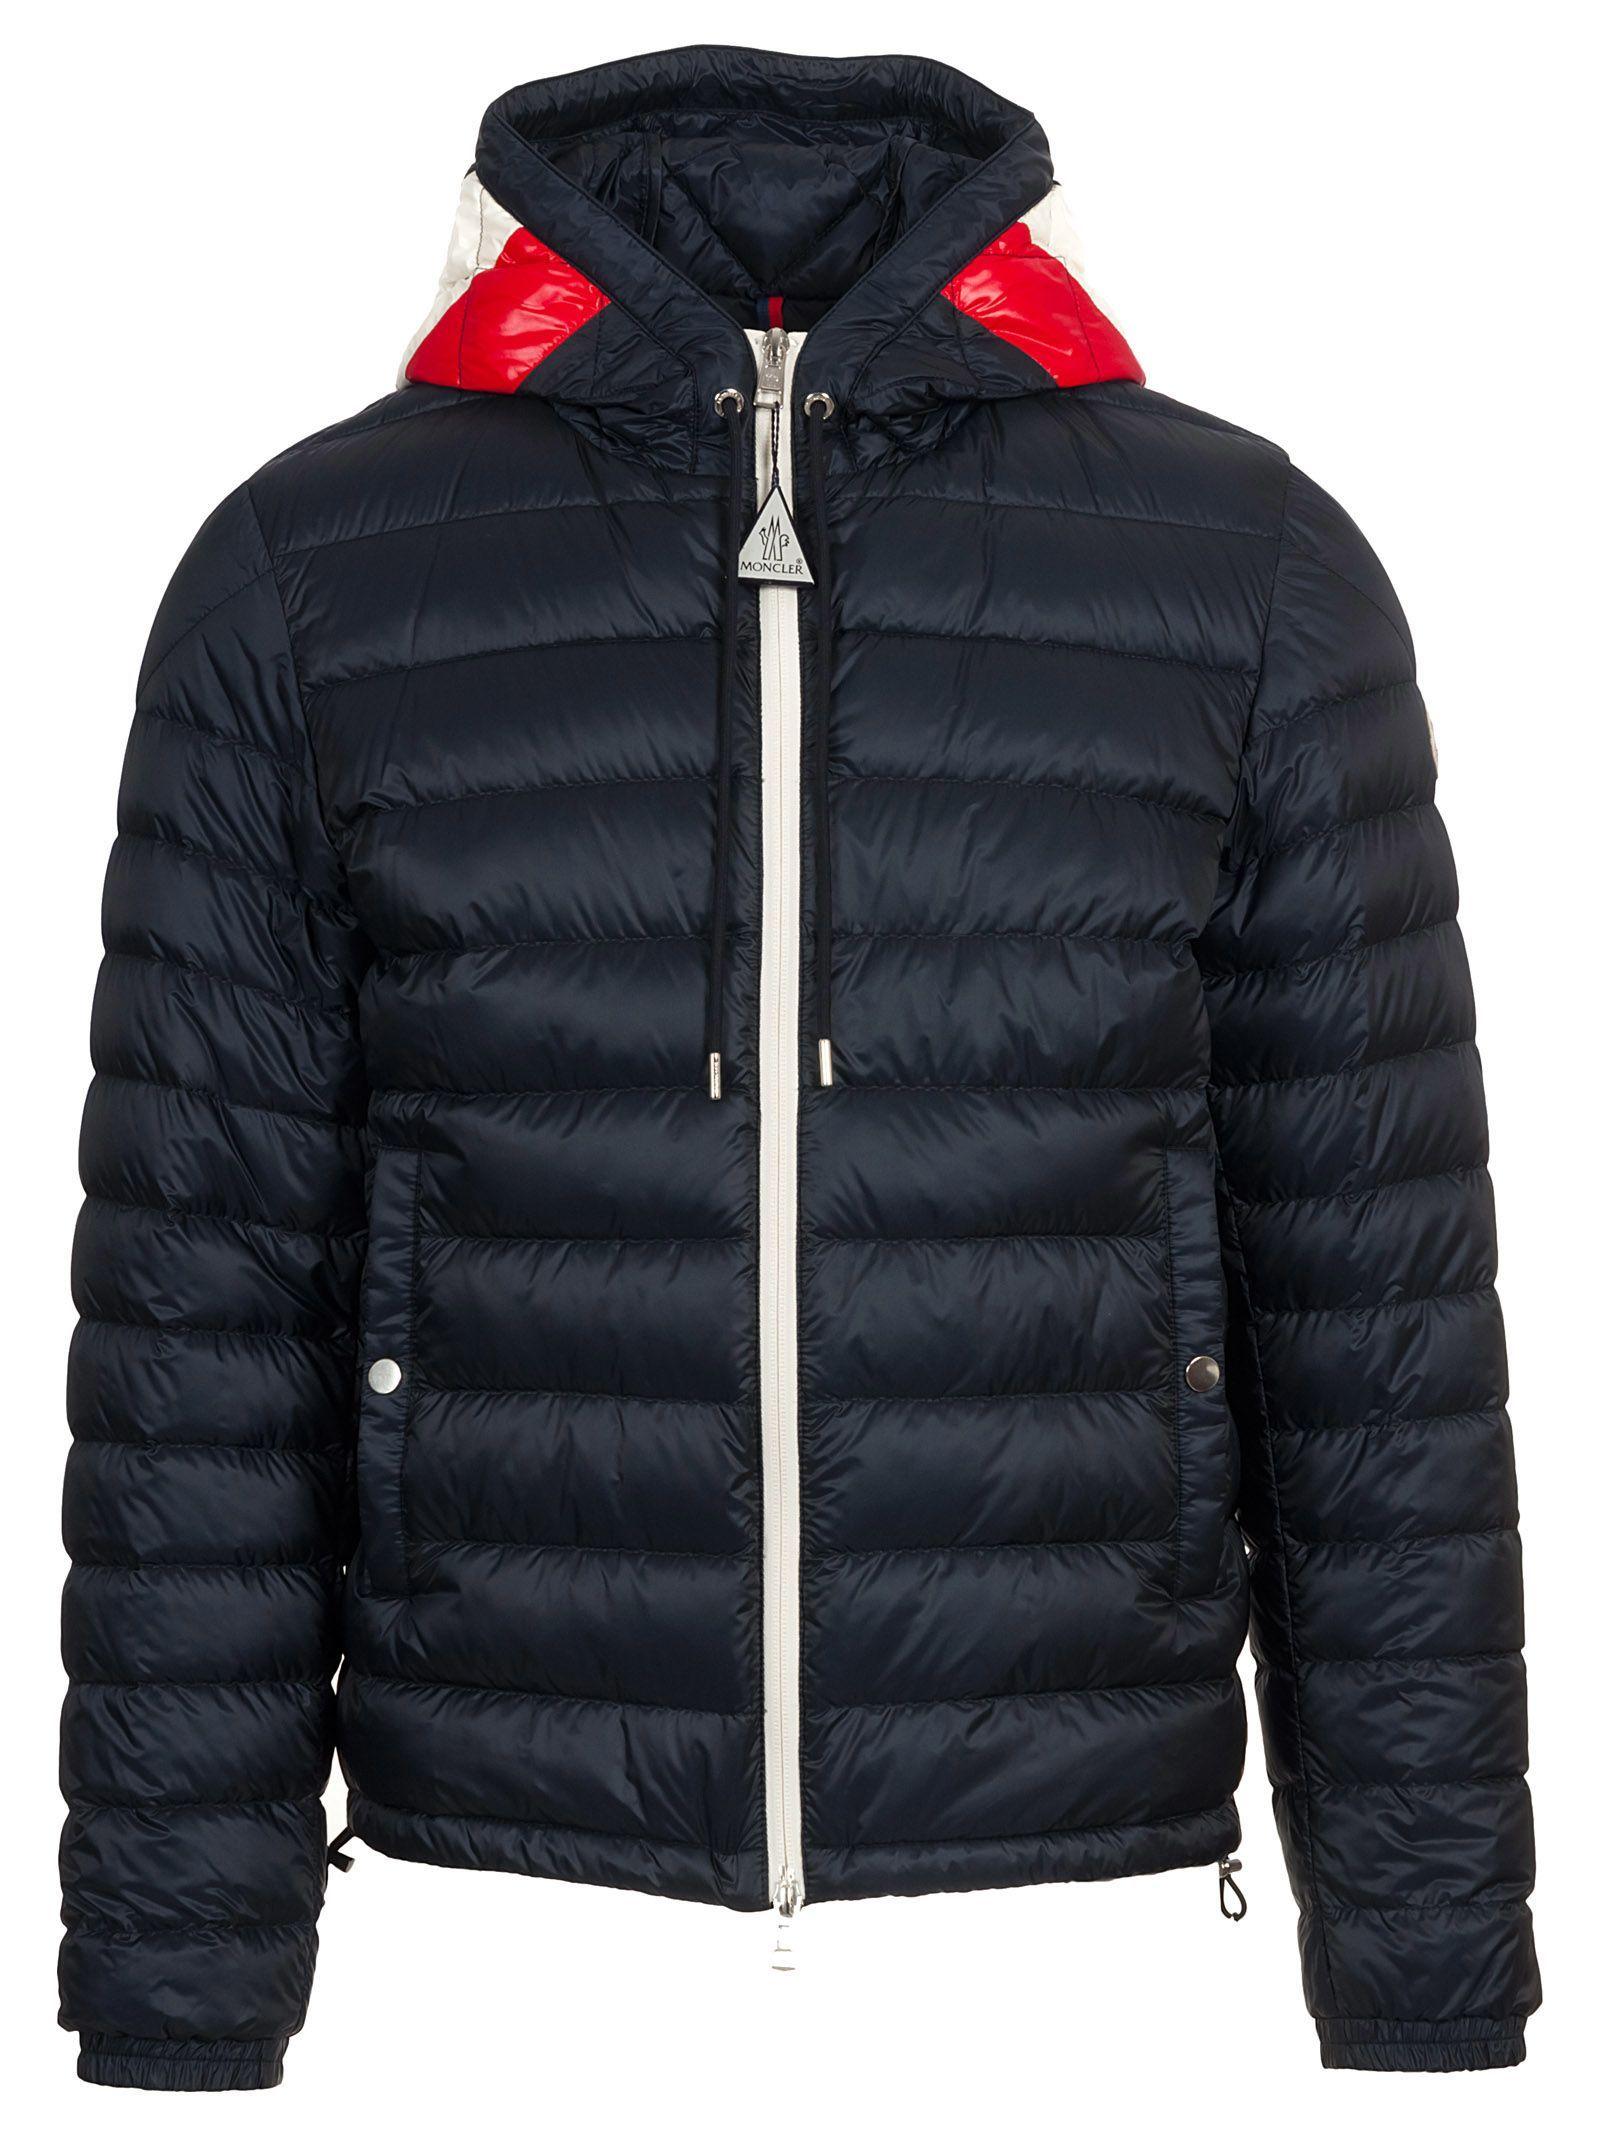 Moncler Ceze Jacket In Blu Notte Modesens Jackets Moncler Woolrich [ 2136 x 1600 Pixel ]